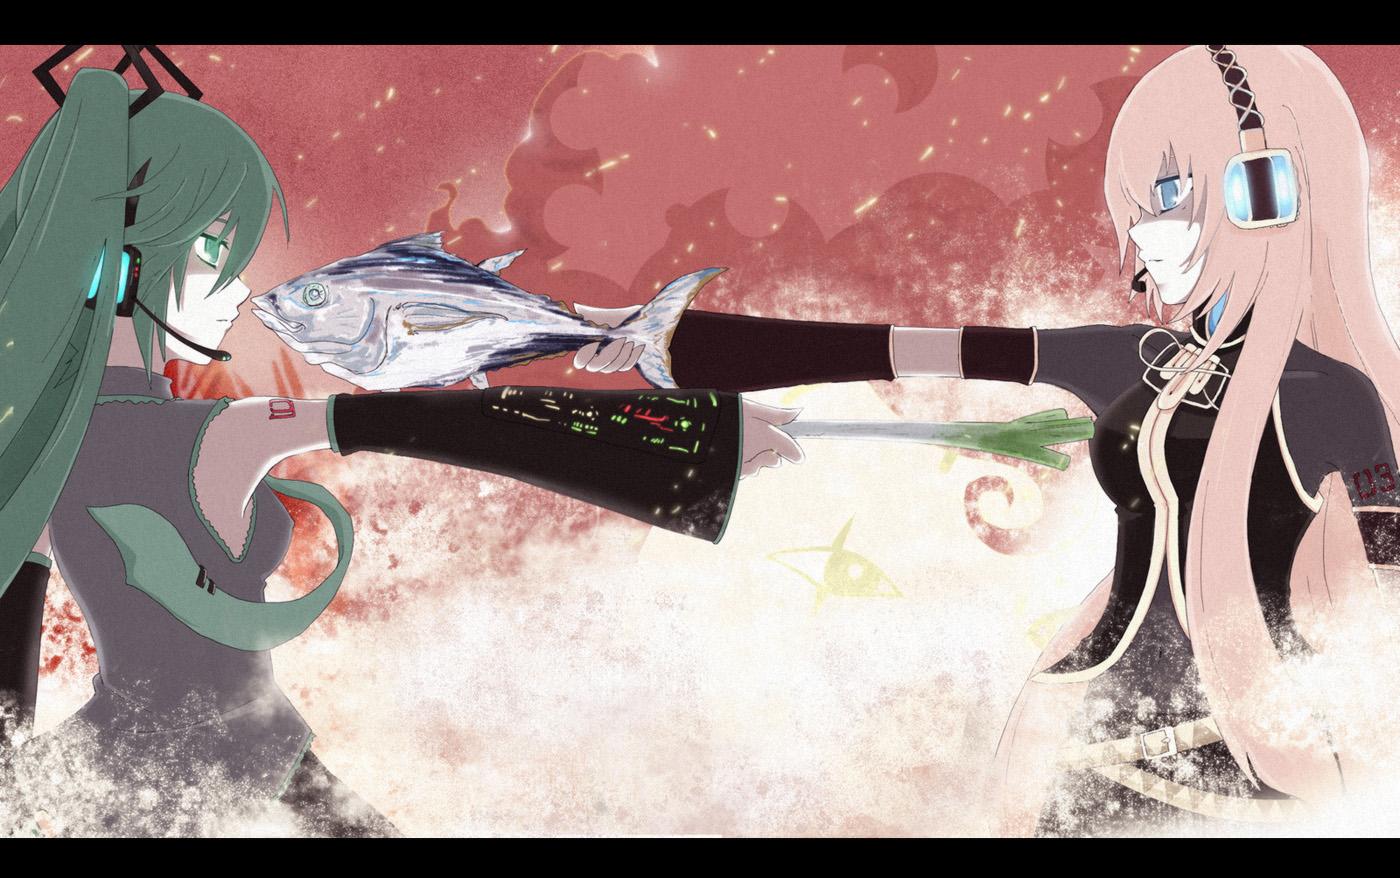 blue_eyes green_eyes green_hair hatsune_miku headphones long_hair megurine_luka pink_hair tie twintails vocaloid